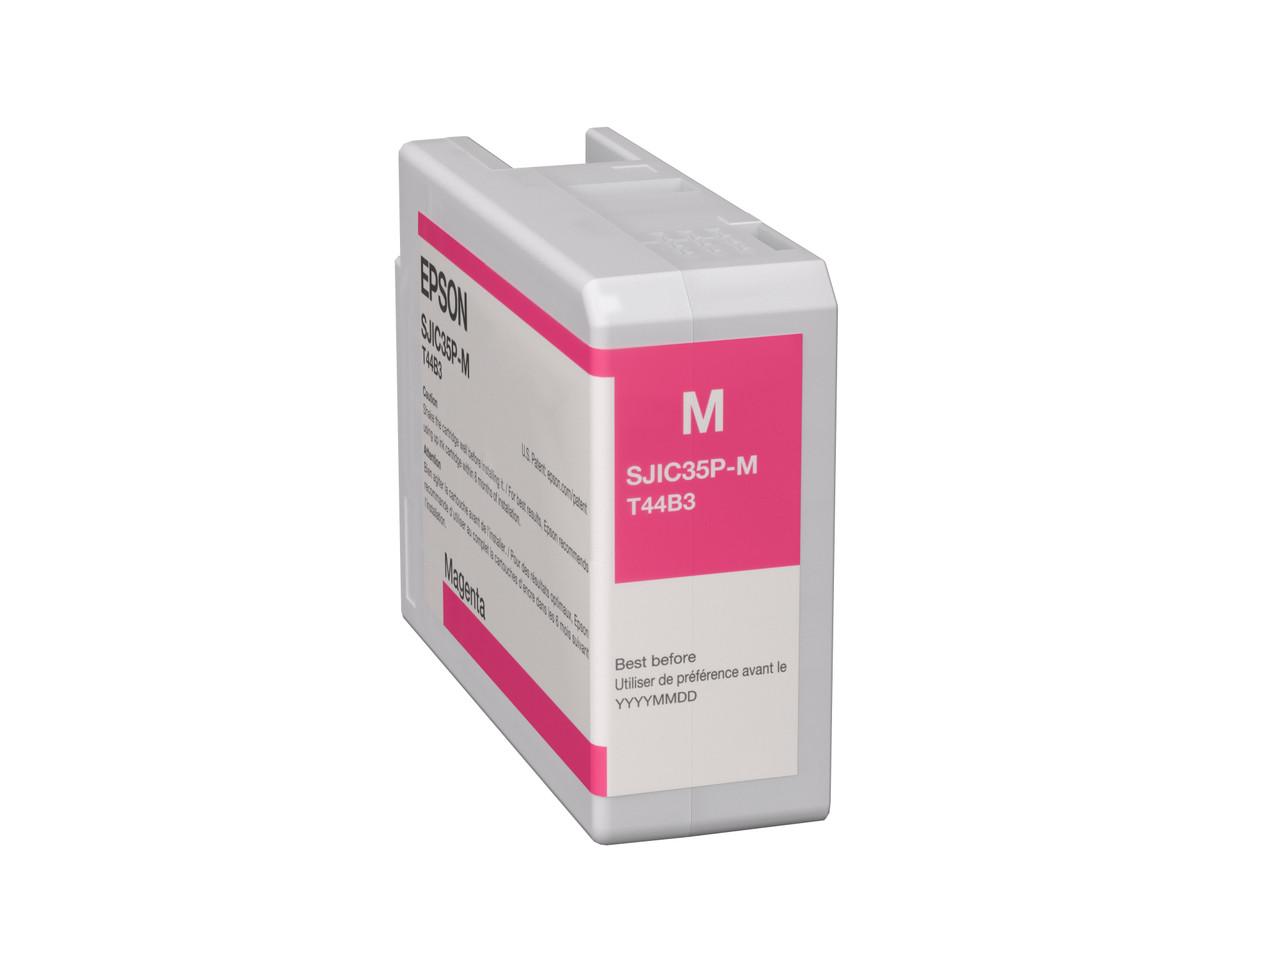 Epson SJIC35P(M) for ColorWorks C6000/C6500 Ink Cartridge - Magenta (C13T44B320)